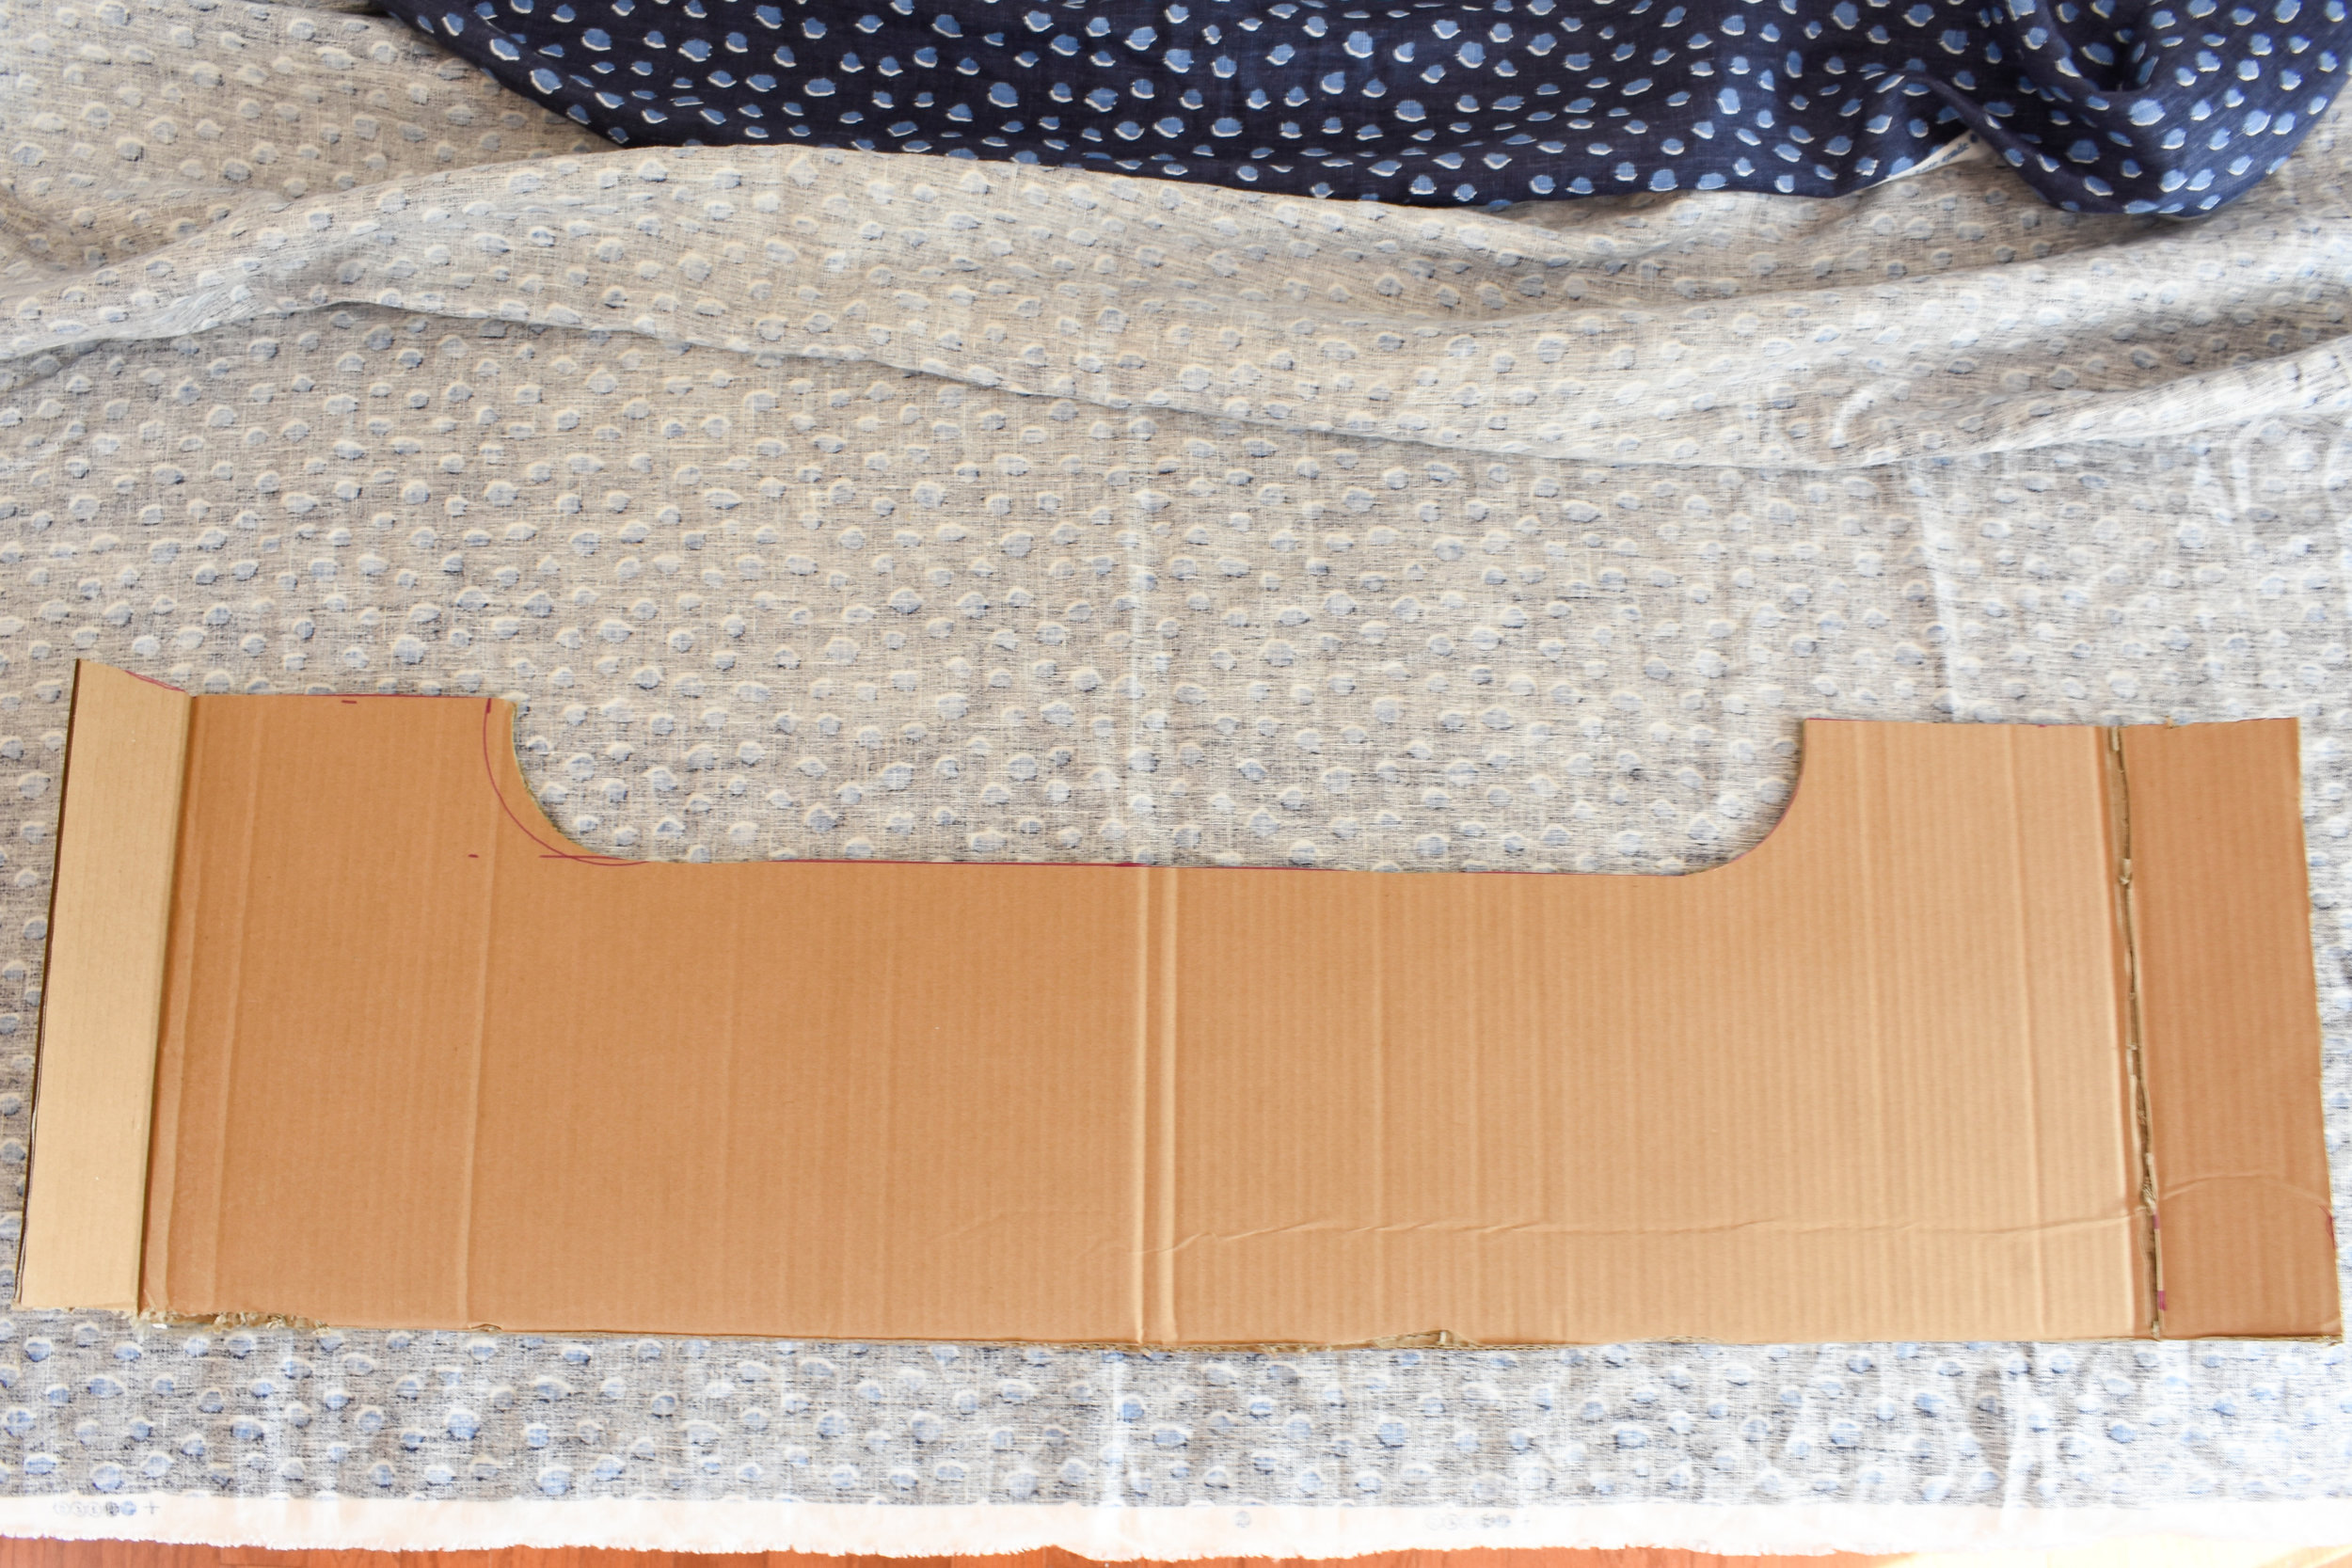 glueing fabric to cardboard for your DIT window cornice